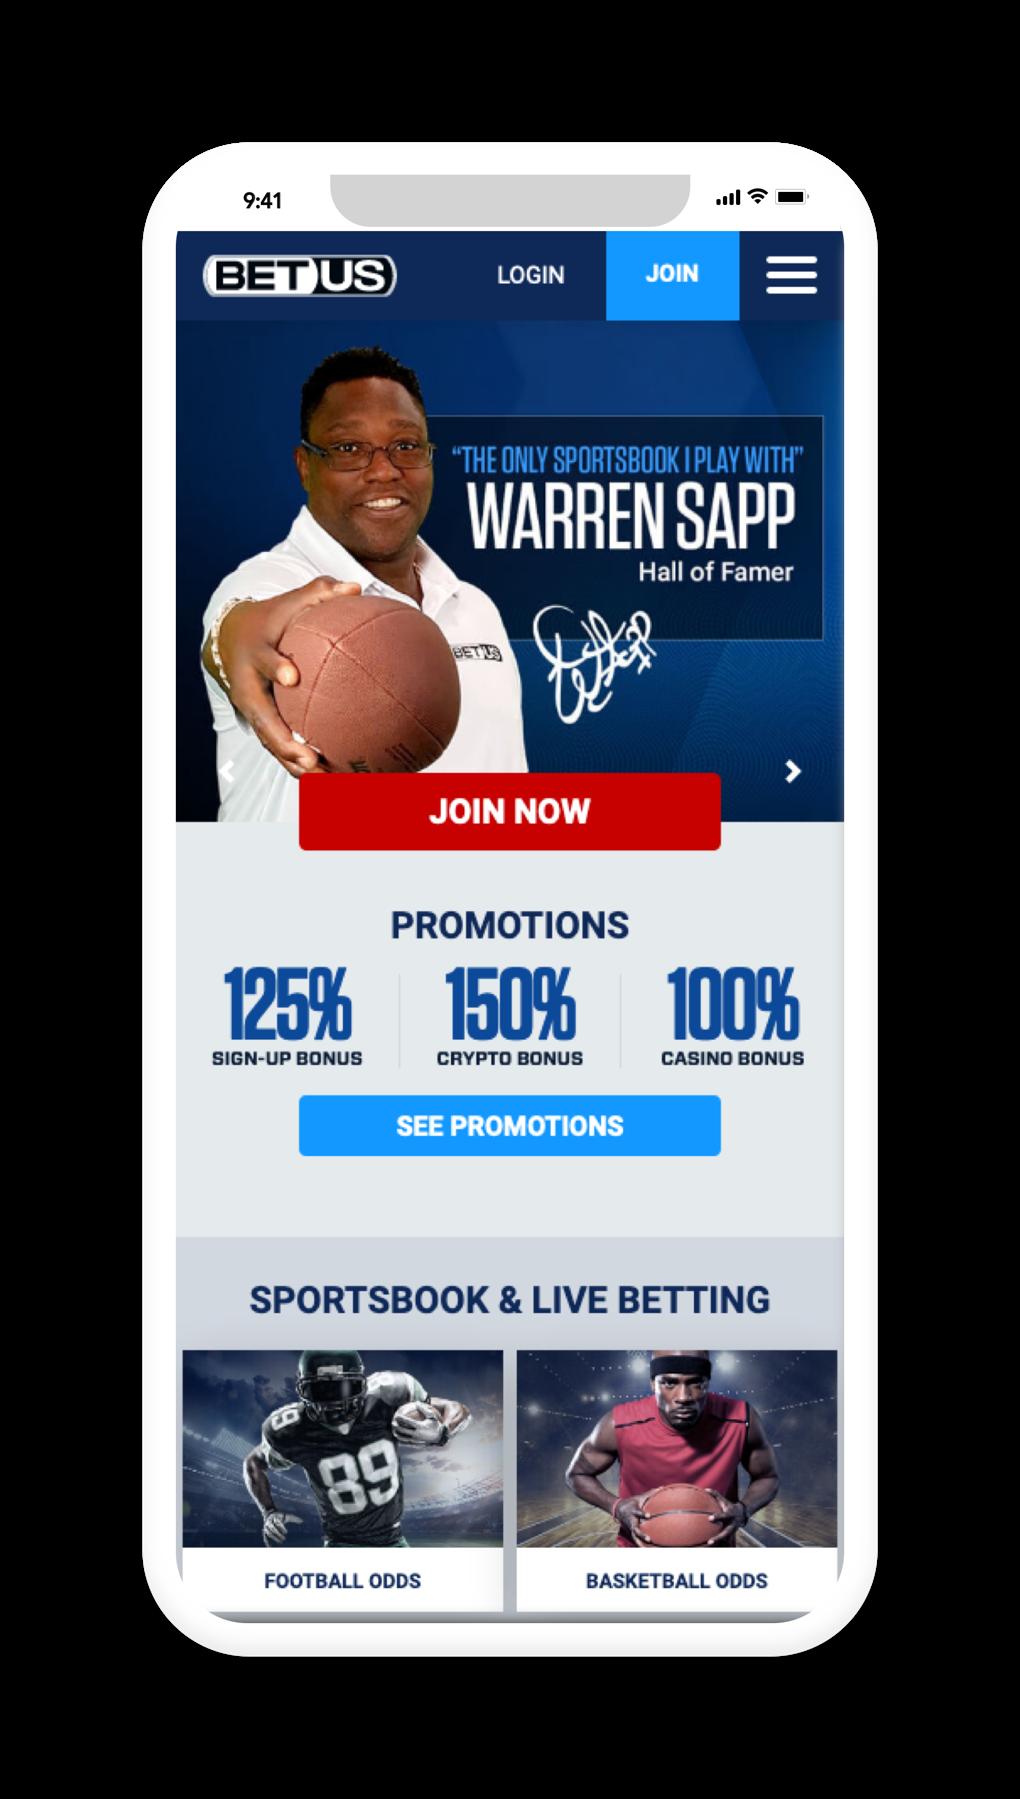 Sports betting & sportsbook online at betus sportsbook golf each way betting rules bet365 online